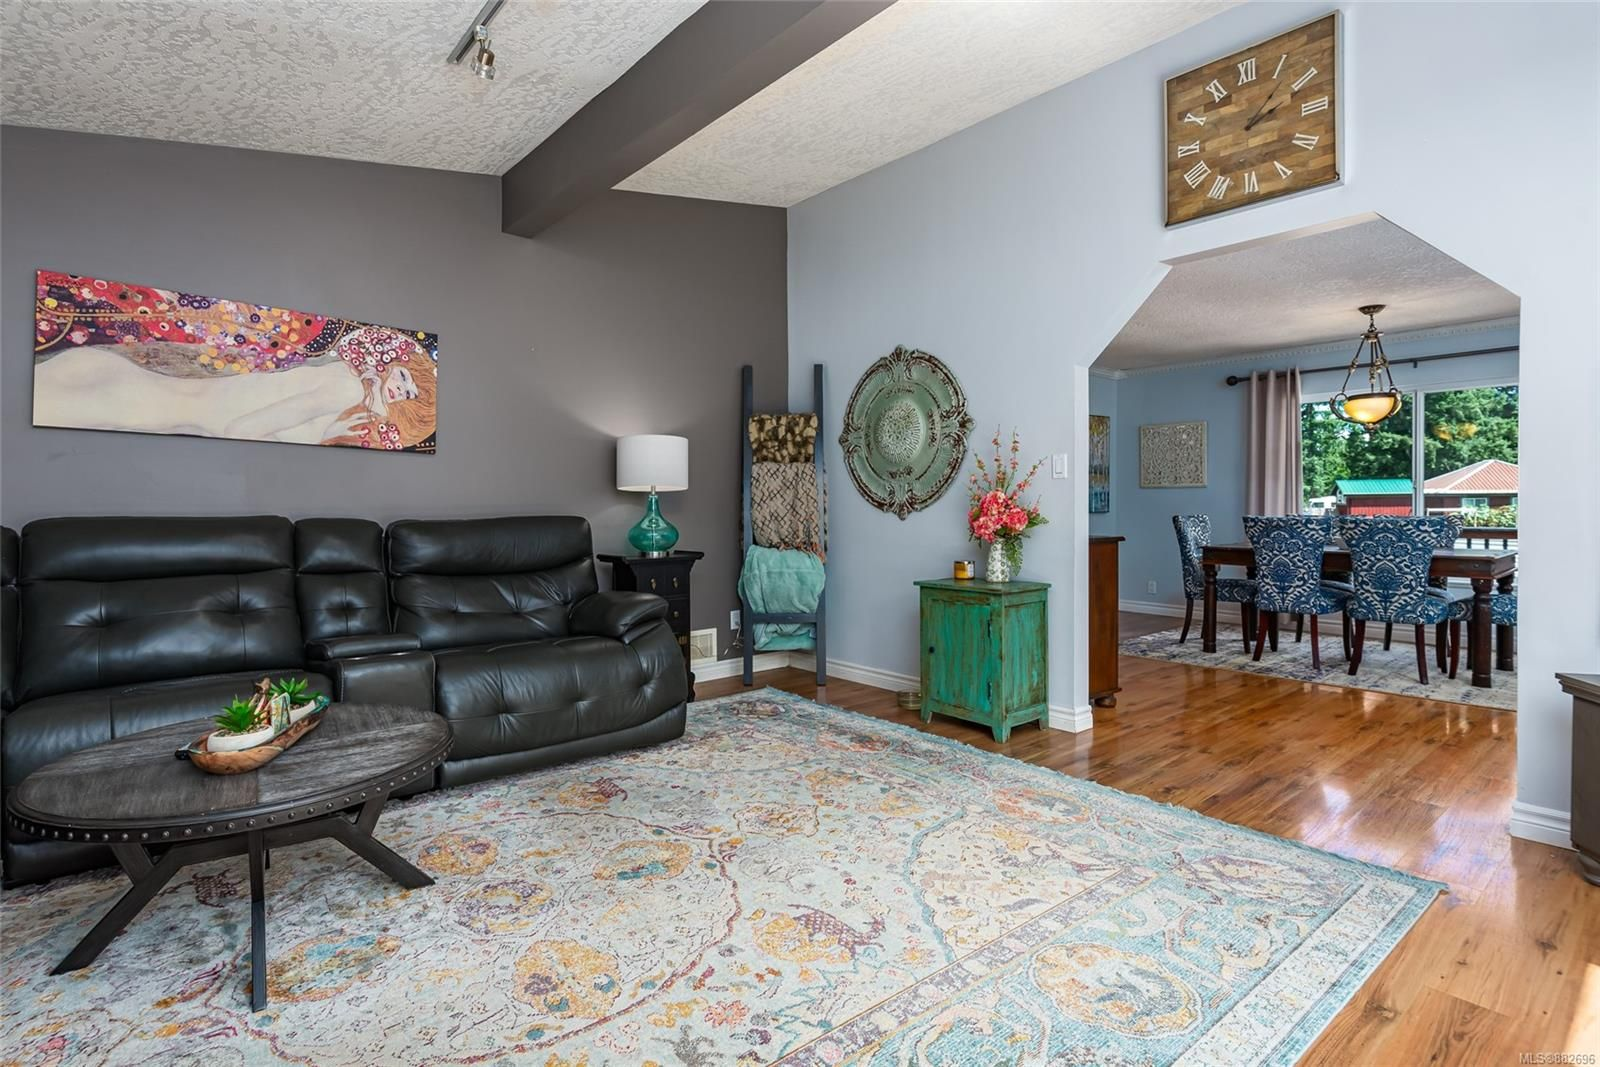 Photo 7: Photos: 3554 MacAulay Rd in : CV Merville Black Creek House for sale (Comox Valley)  : MLS®# 882696